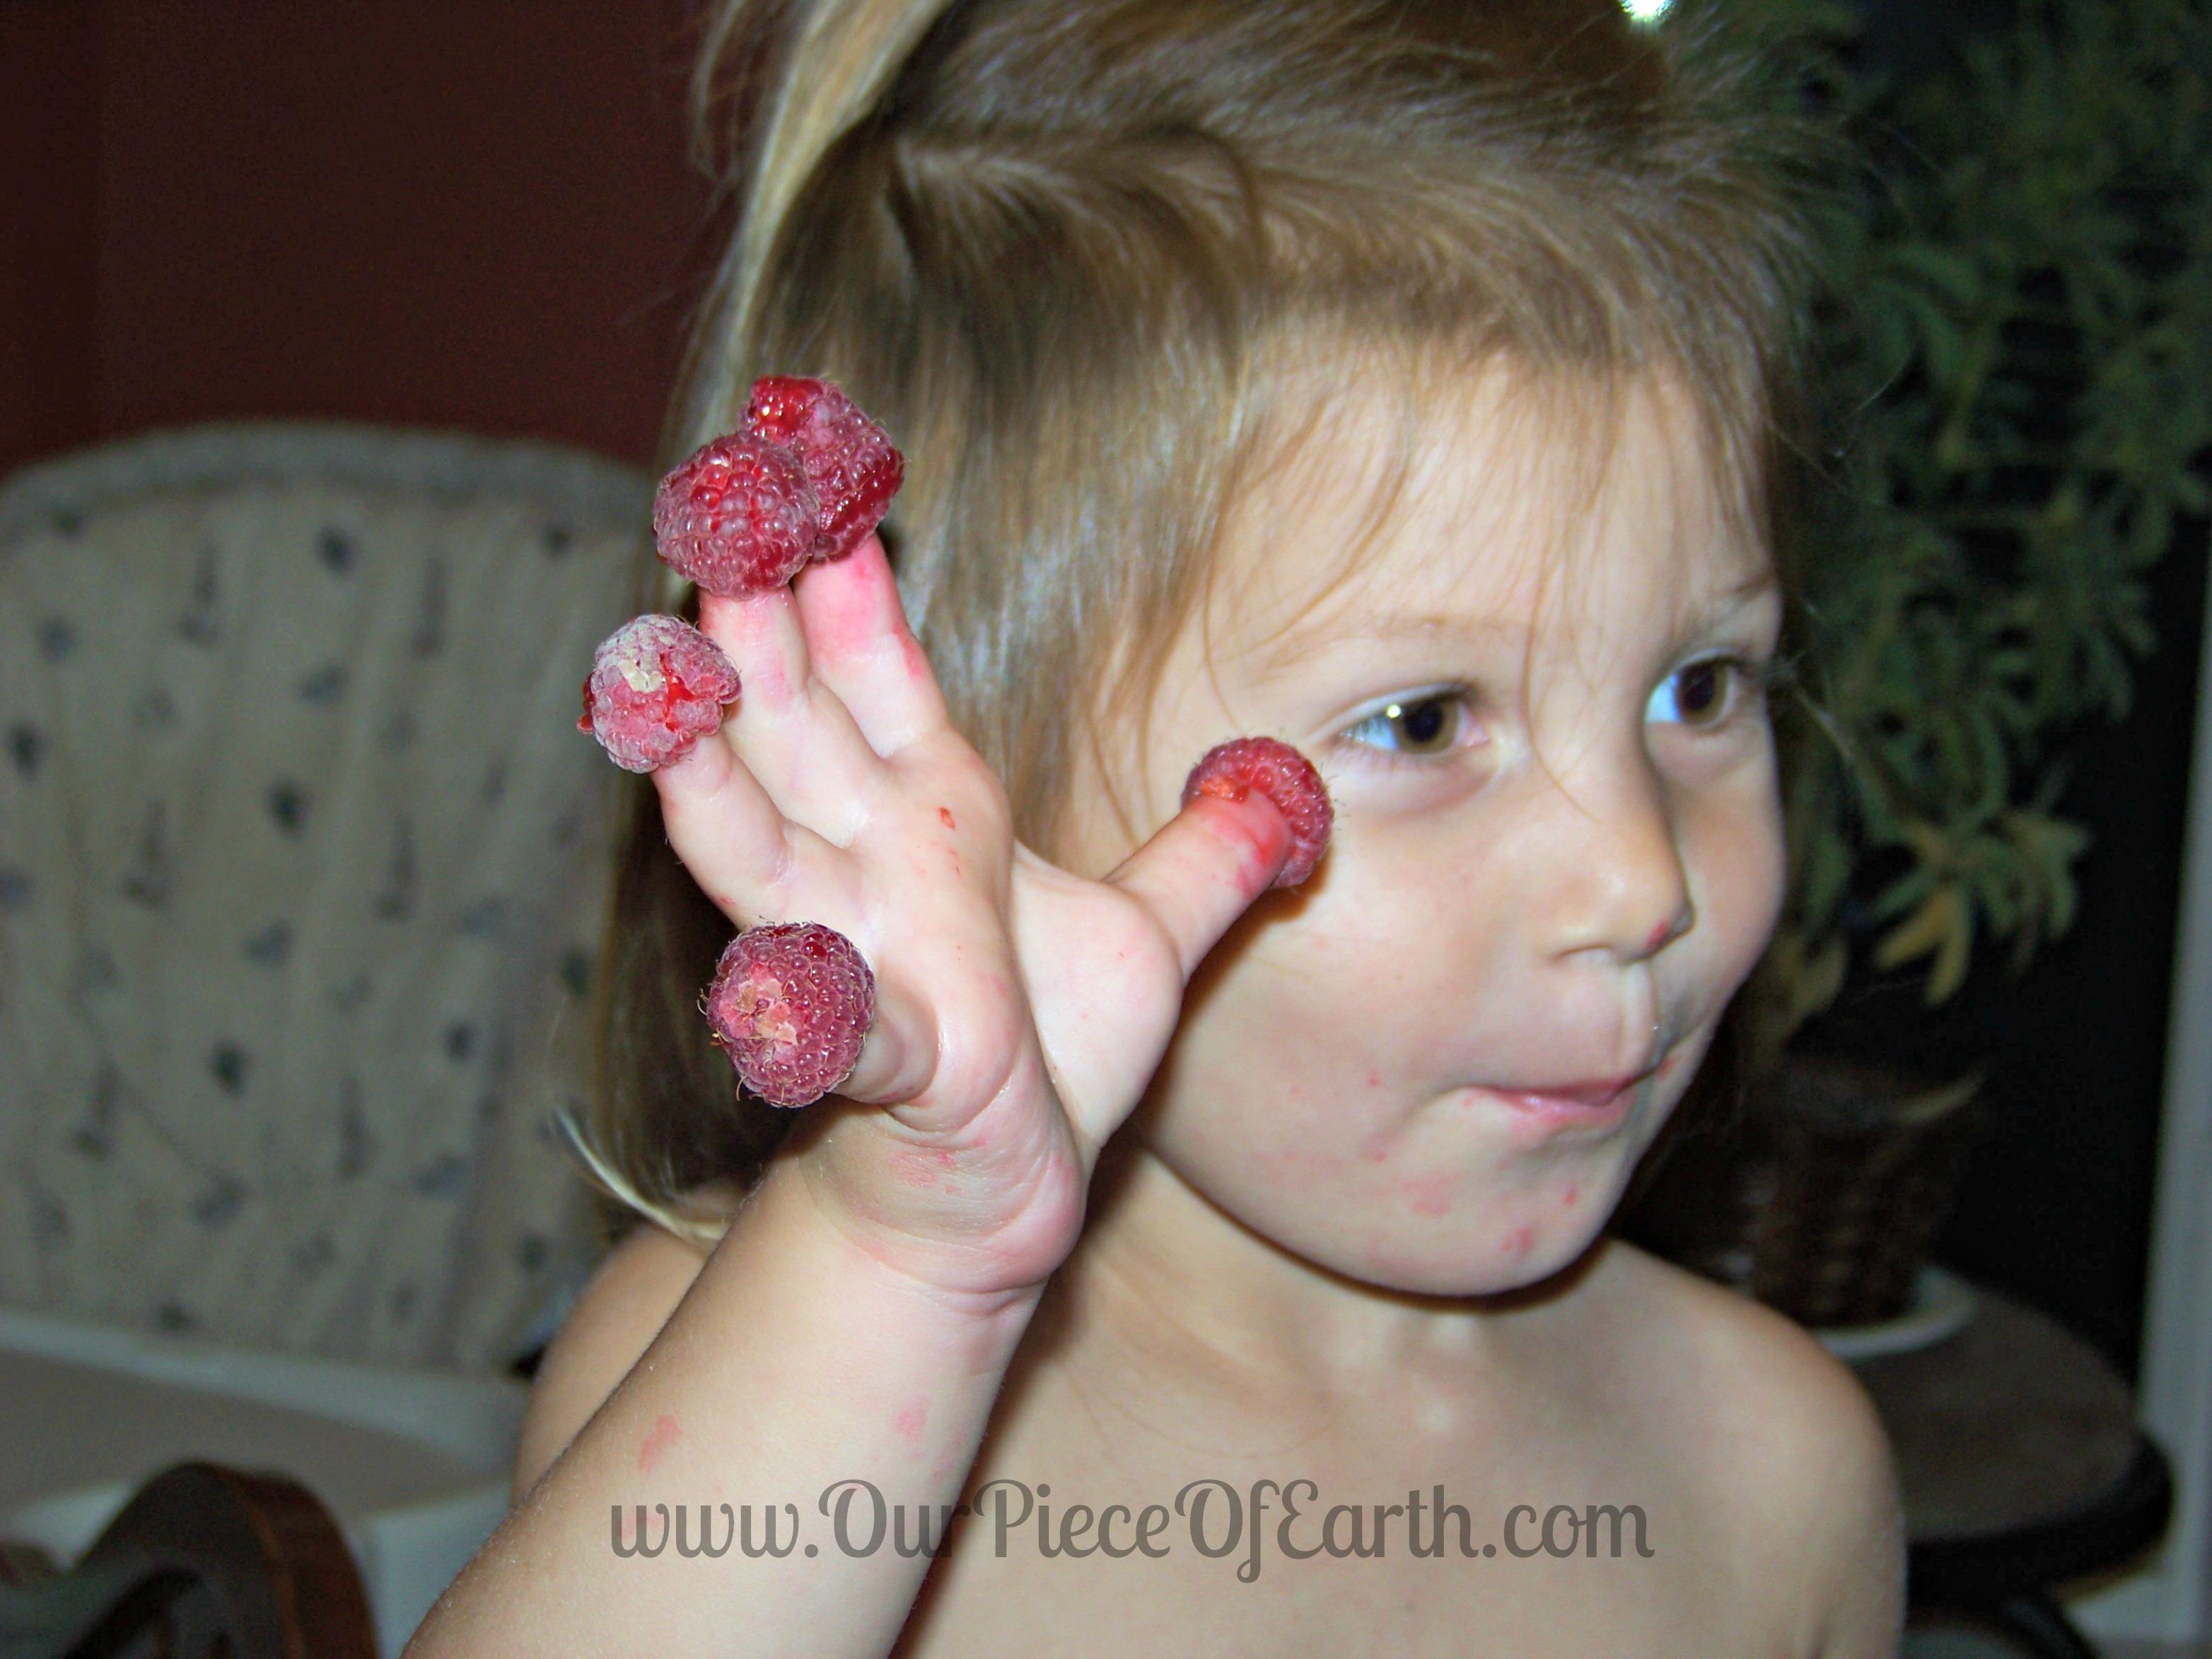 Encouraging healthy eating habits in young children